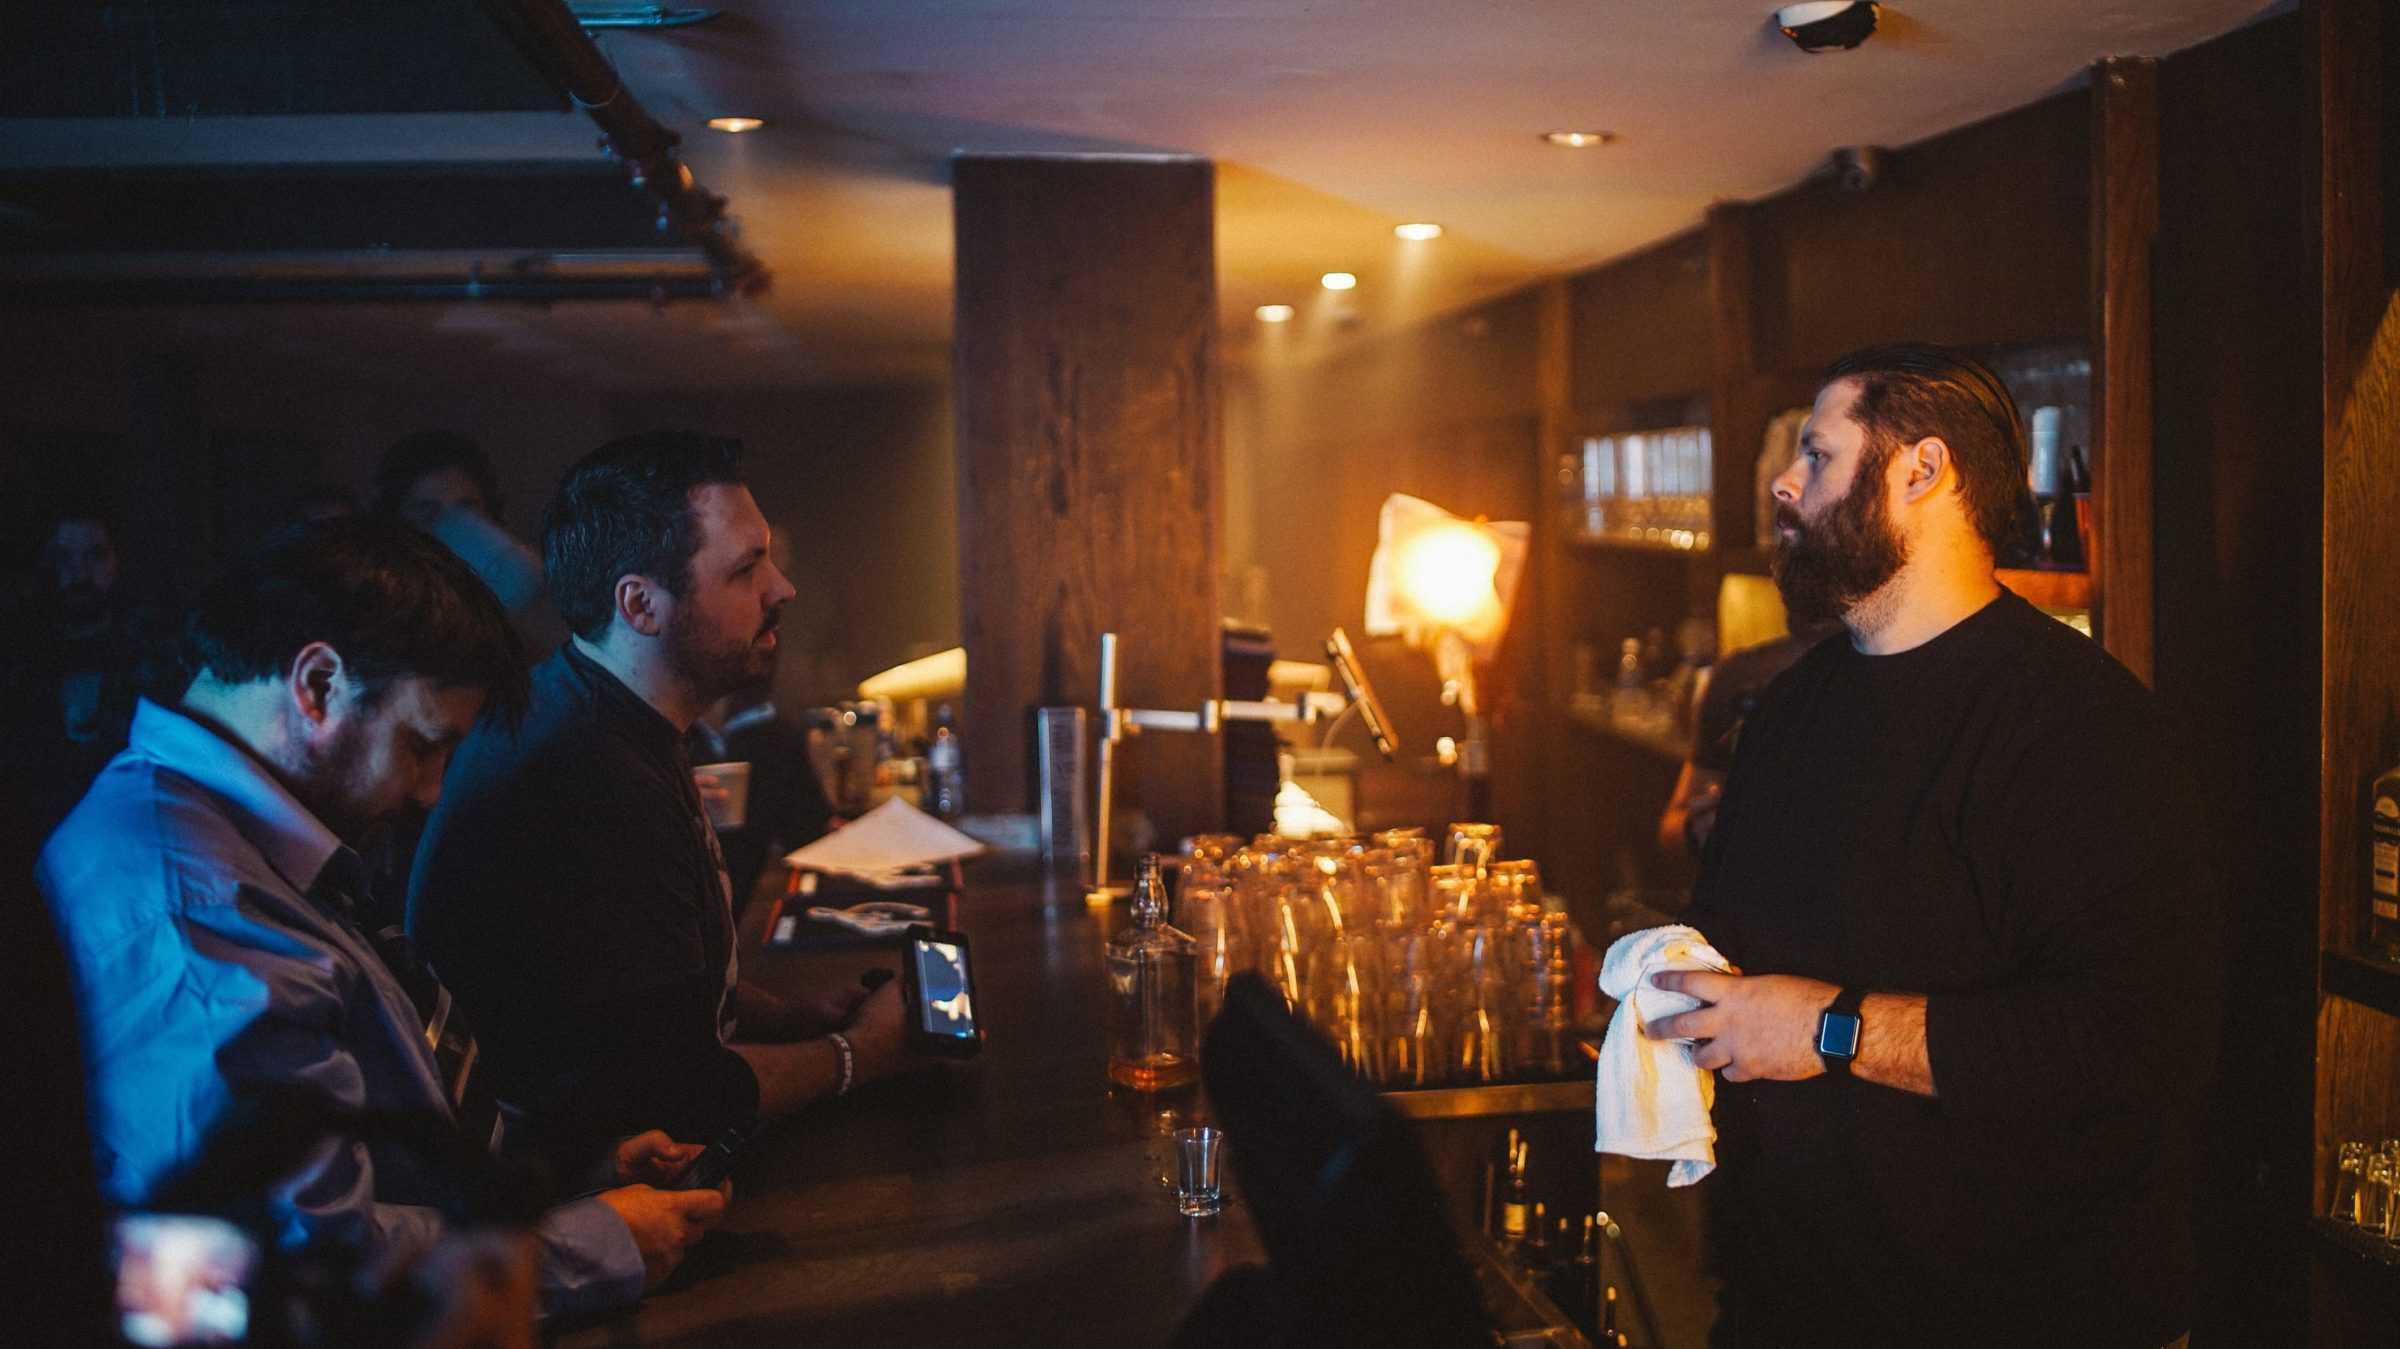 Bar Brawl - Behind the Scenes